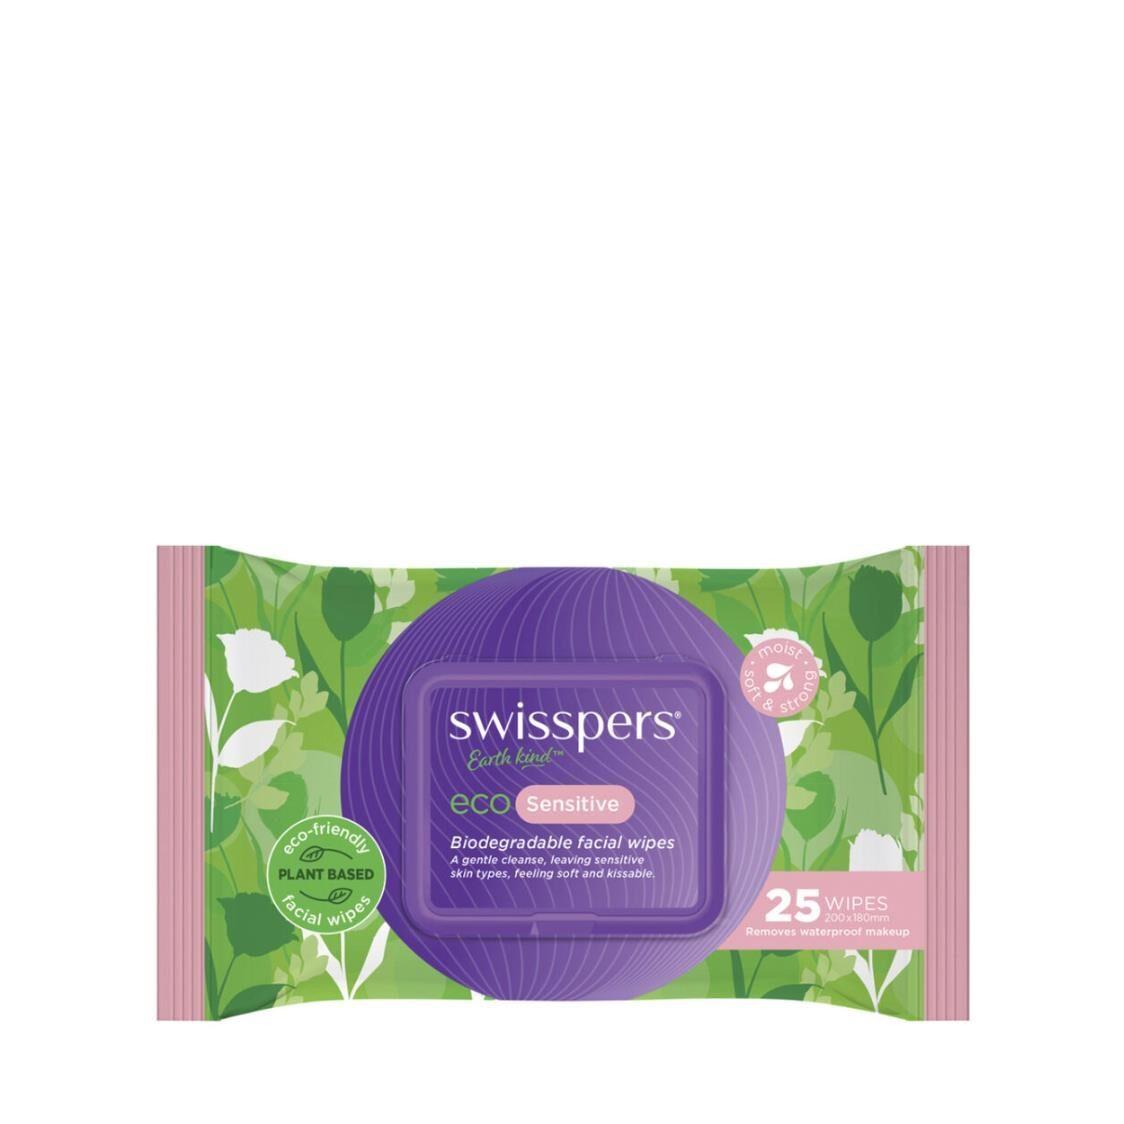 Swisspers Eco Sensitive Biodegradable Facial Wipes 25s